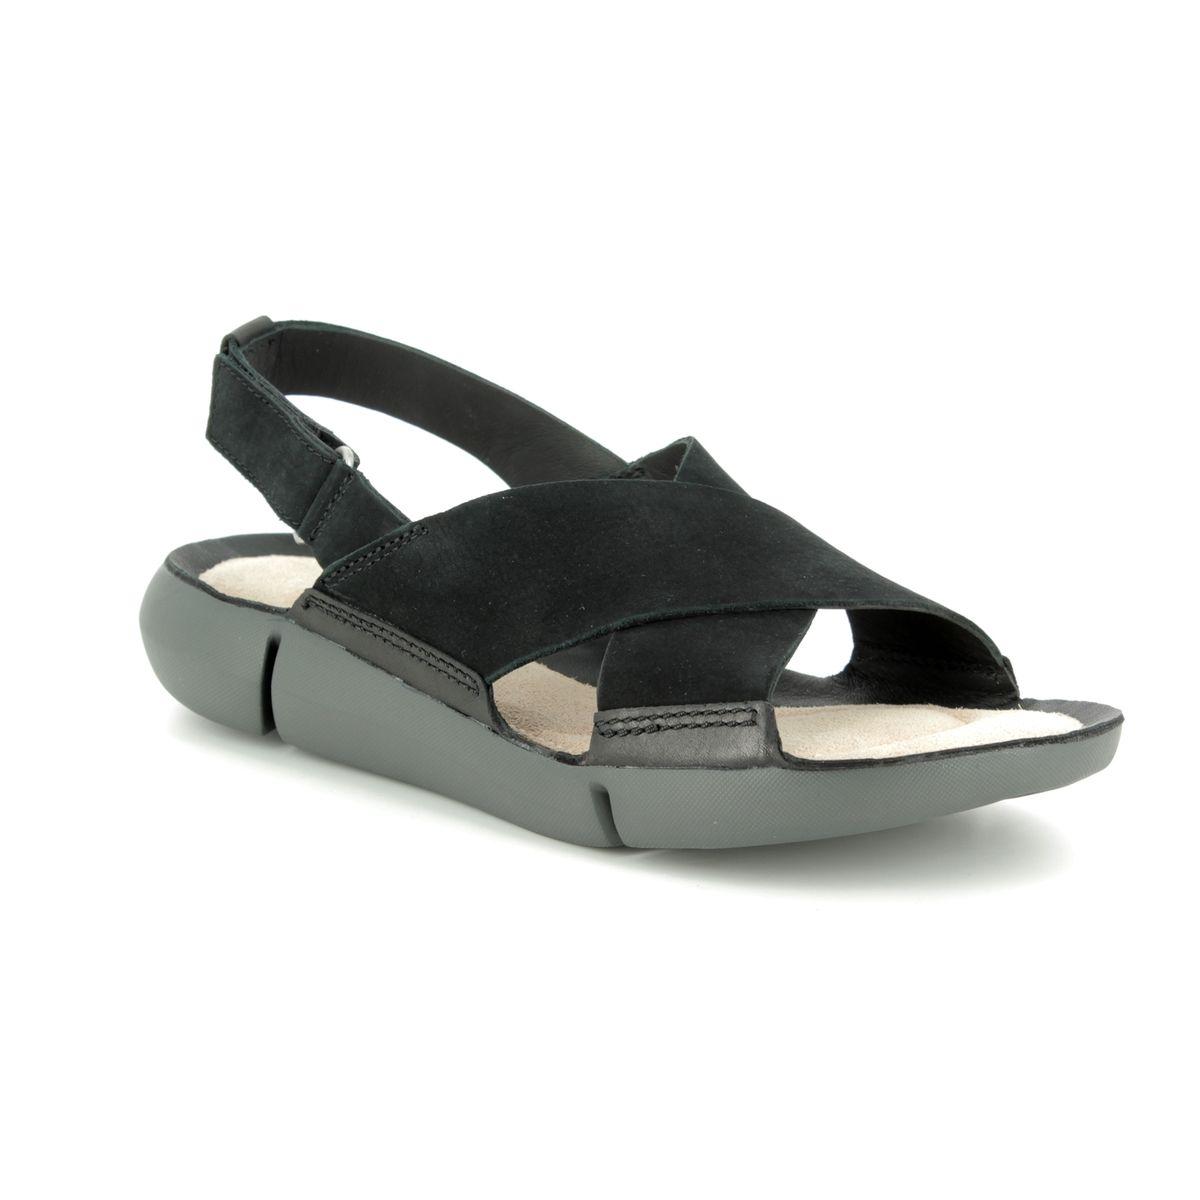 86331310289 Clarks Sandals - Black nubuck - 389484D TRI CHLOE